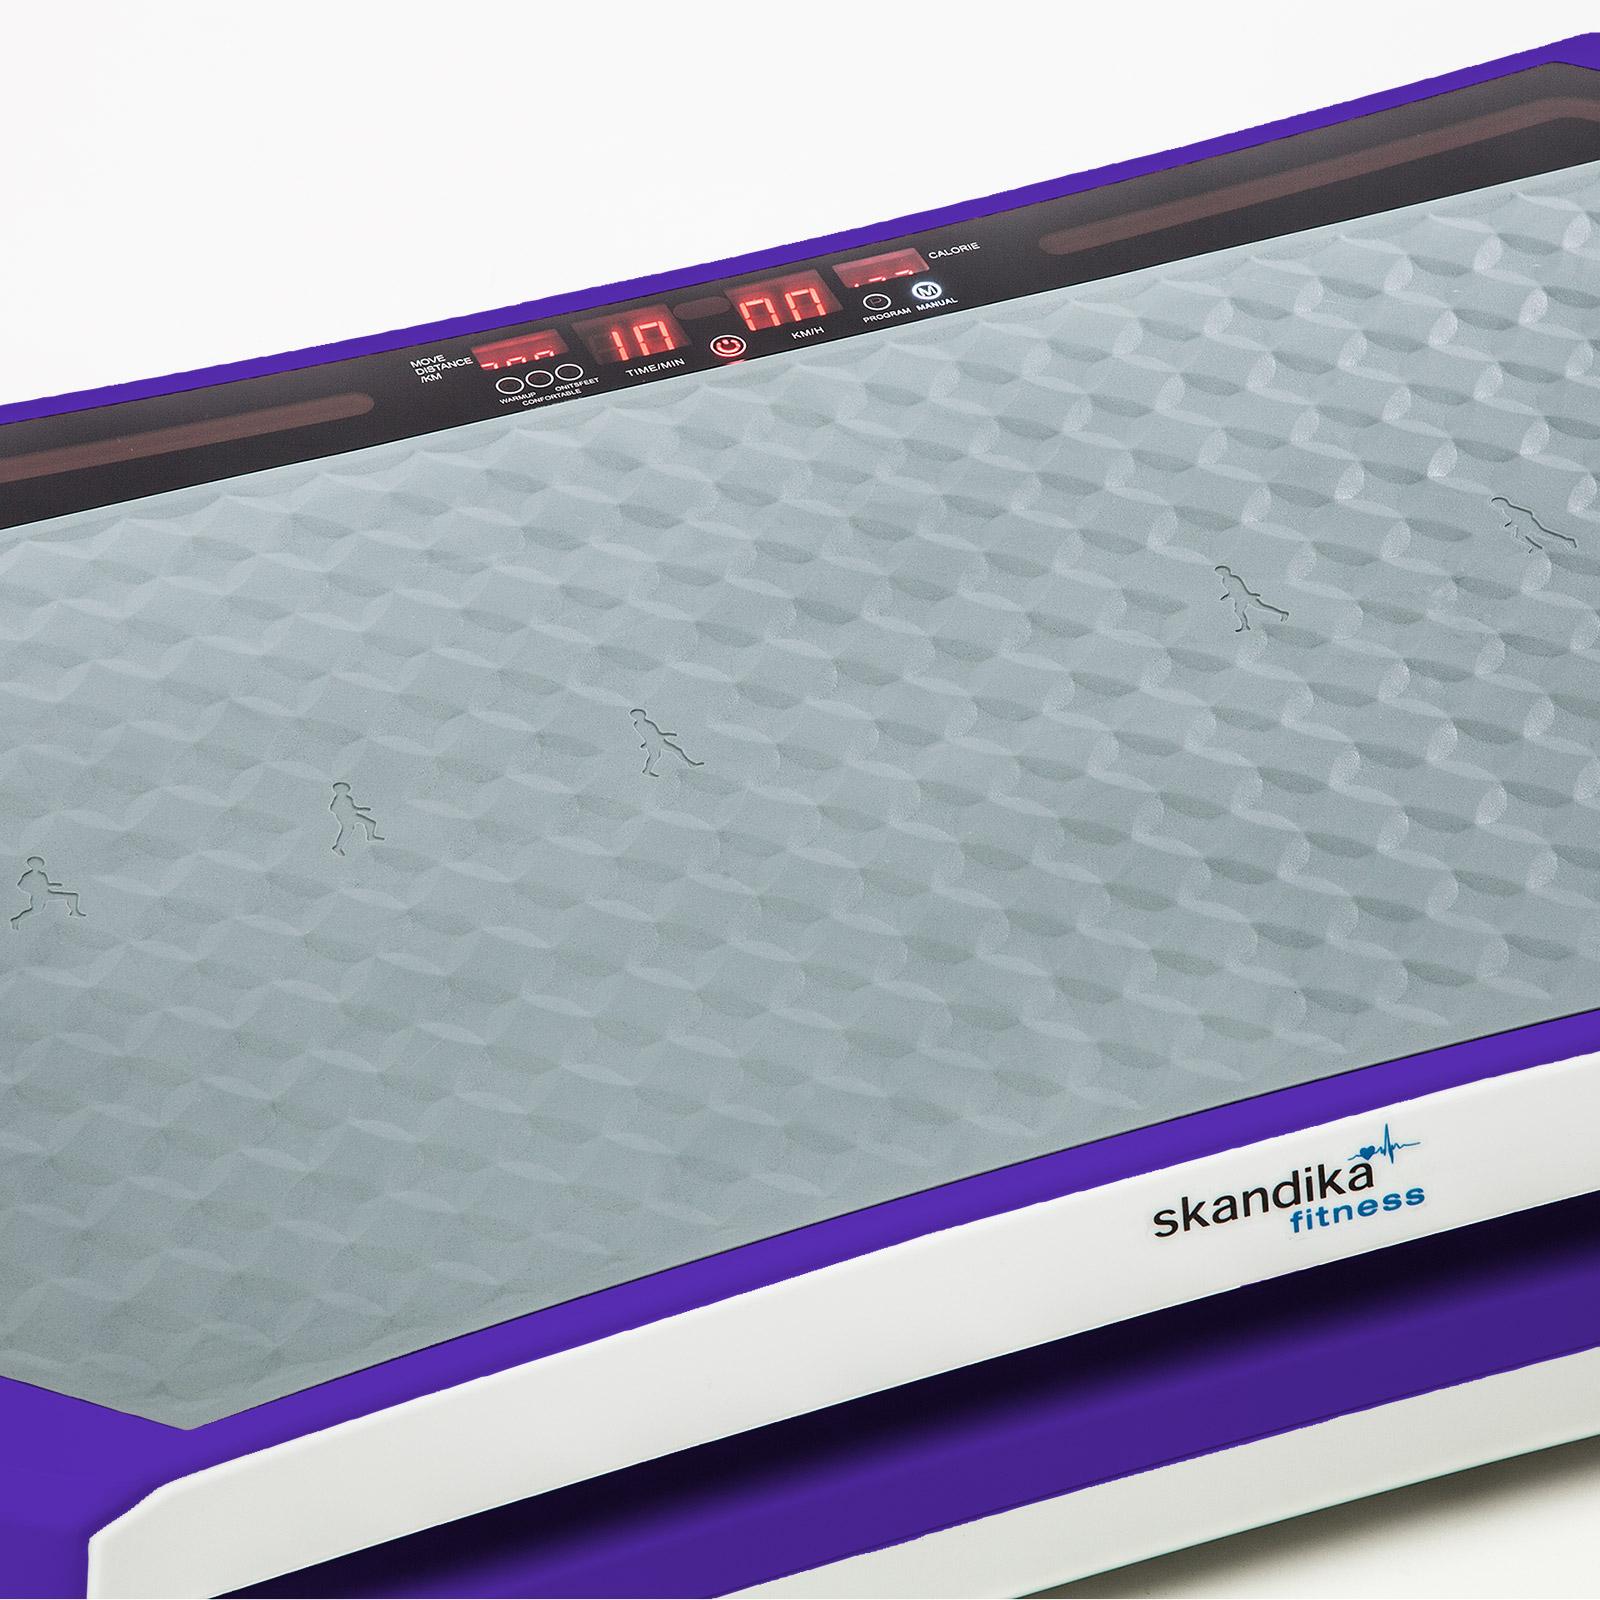 Skandika vibration plate 900 plateforme vibrante oscillante de salon lila neu - Plateforme oscillante vibrante ...